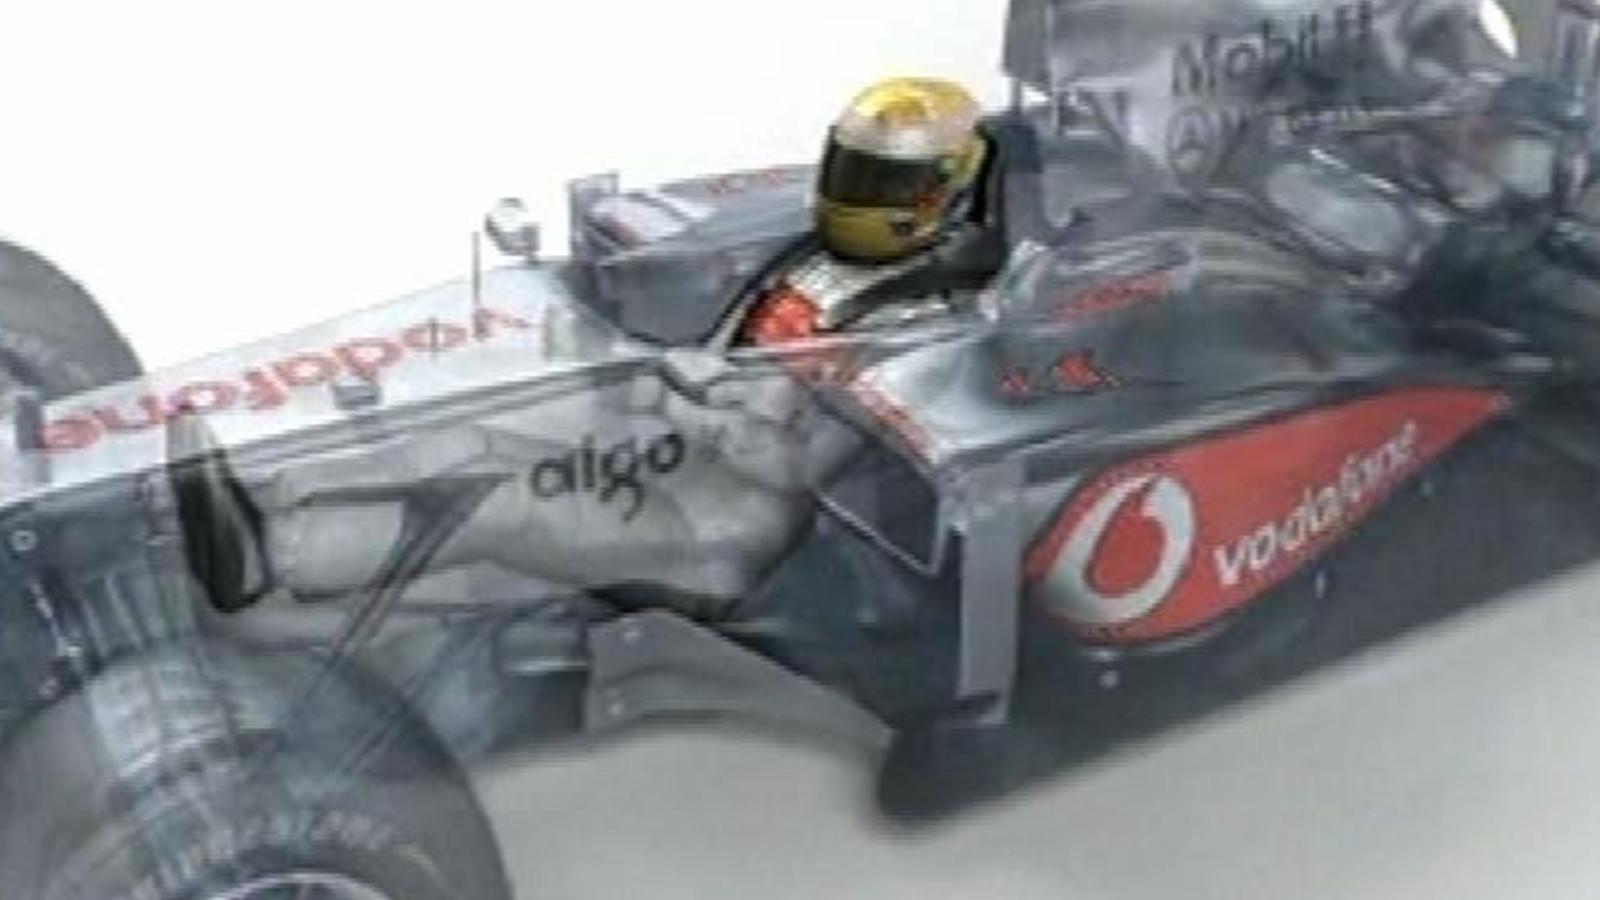 Le f duct de la mclaren formule 1 eurosport - Formule vitesse de coupe ...